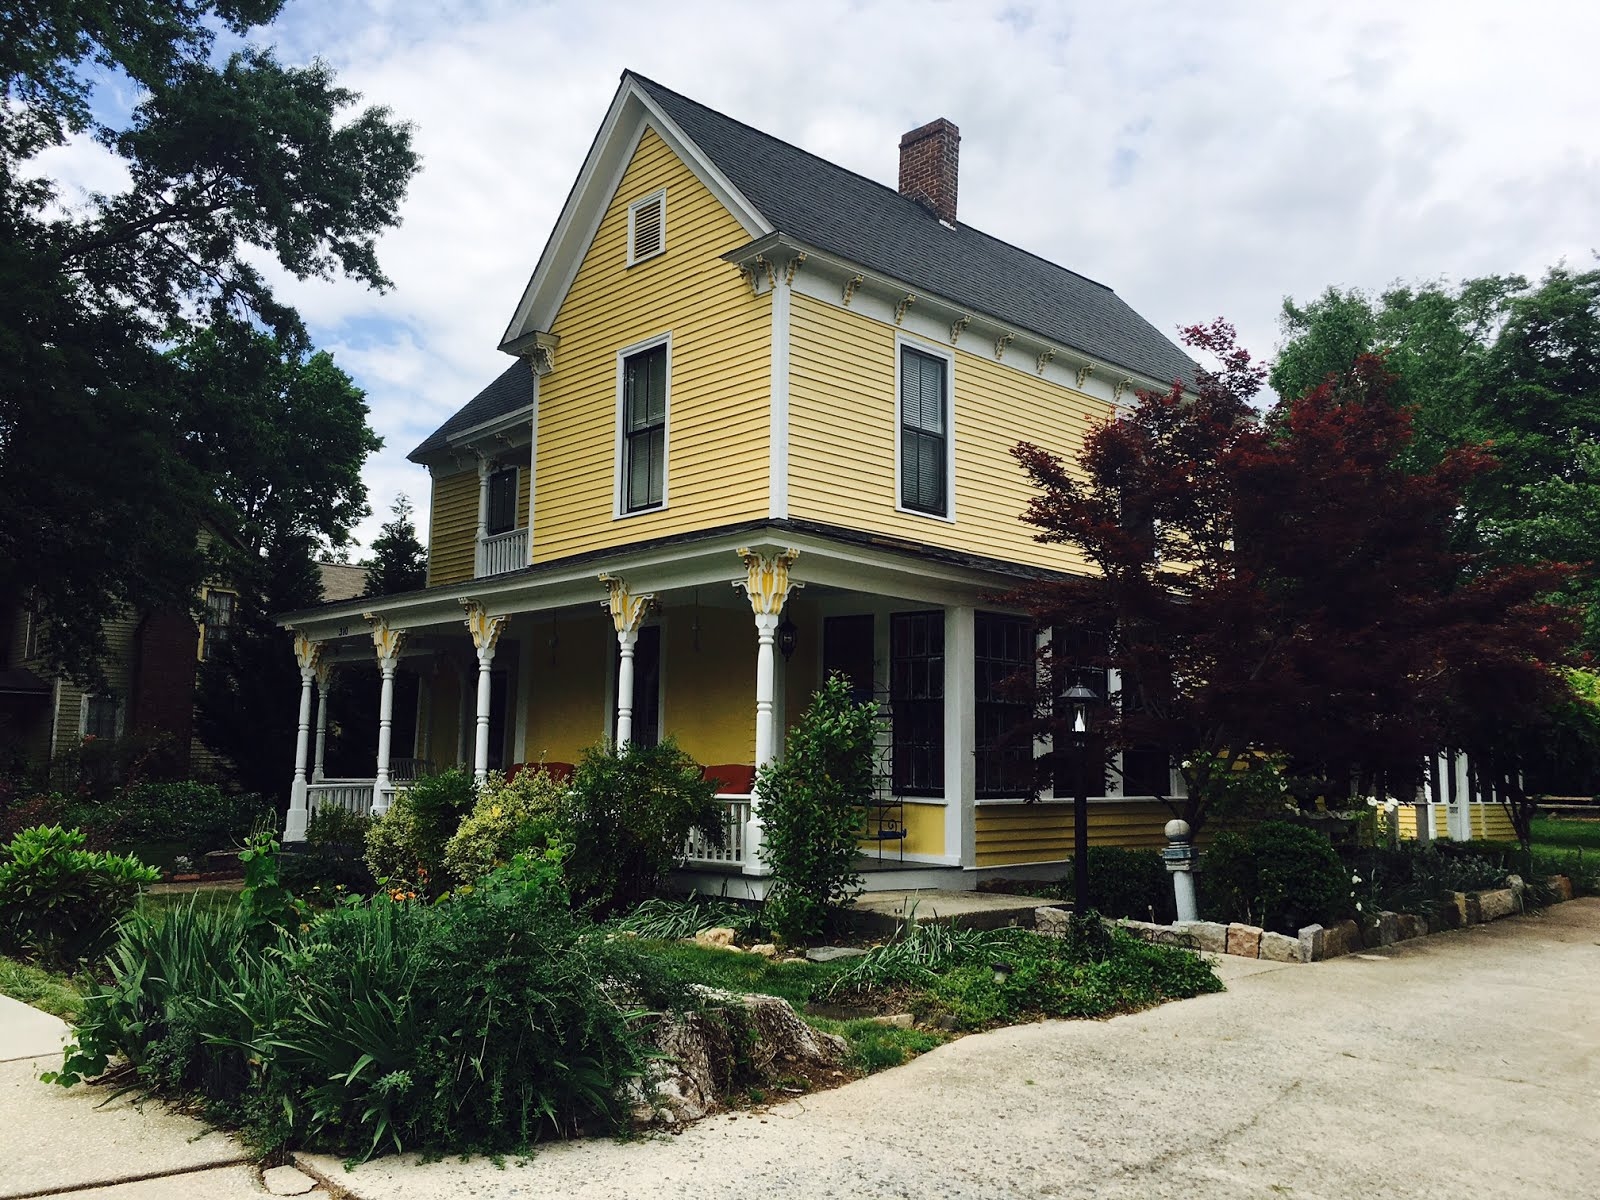 310 E. Bank Street, Salisbury NC 28144 ~ circa 1895 ! $254,000